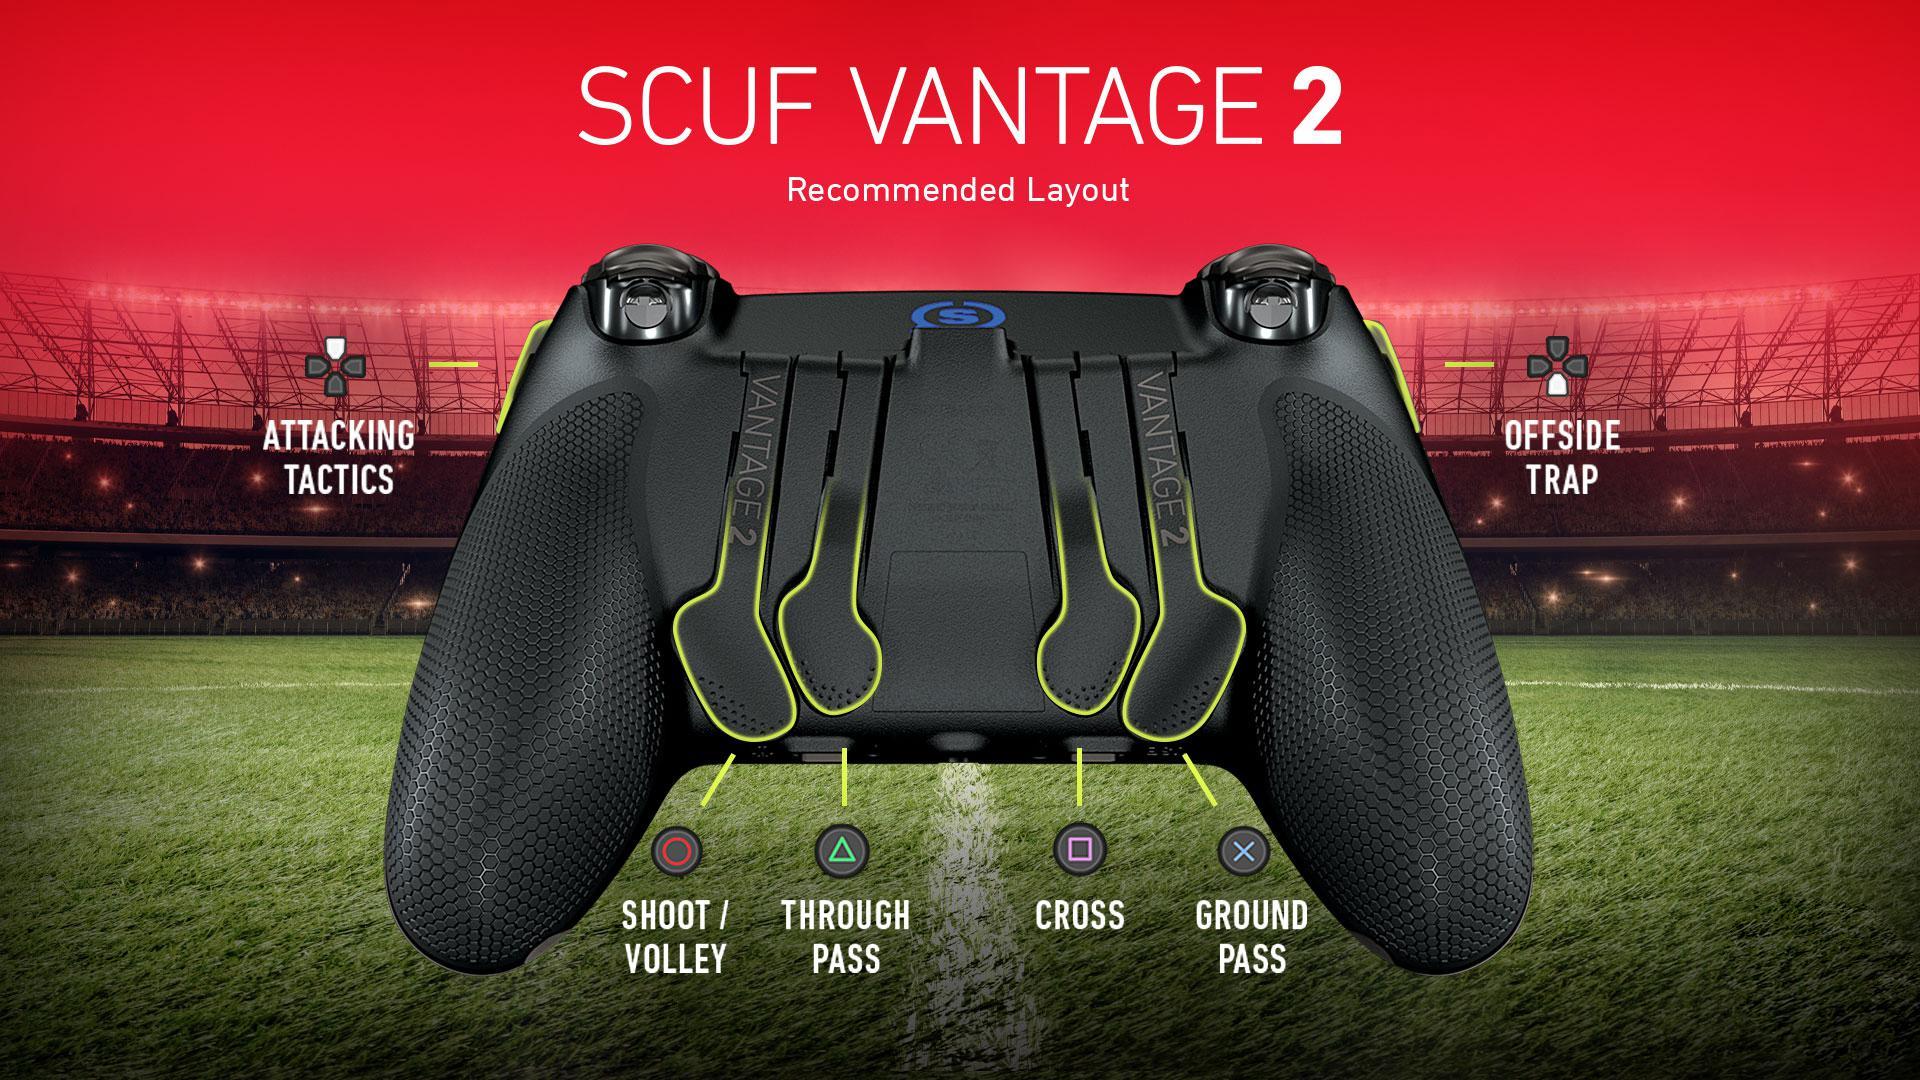 SCUF Vantage 2 FIFA 20 Controller Configuration